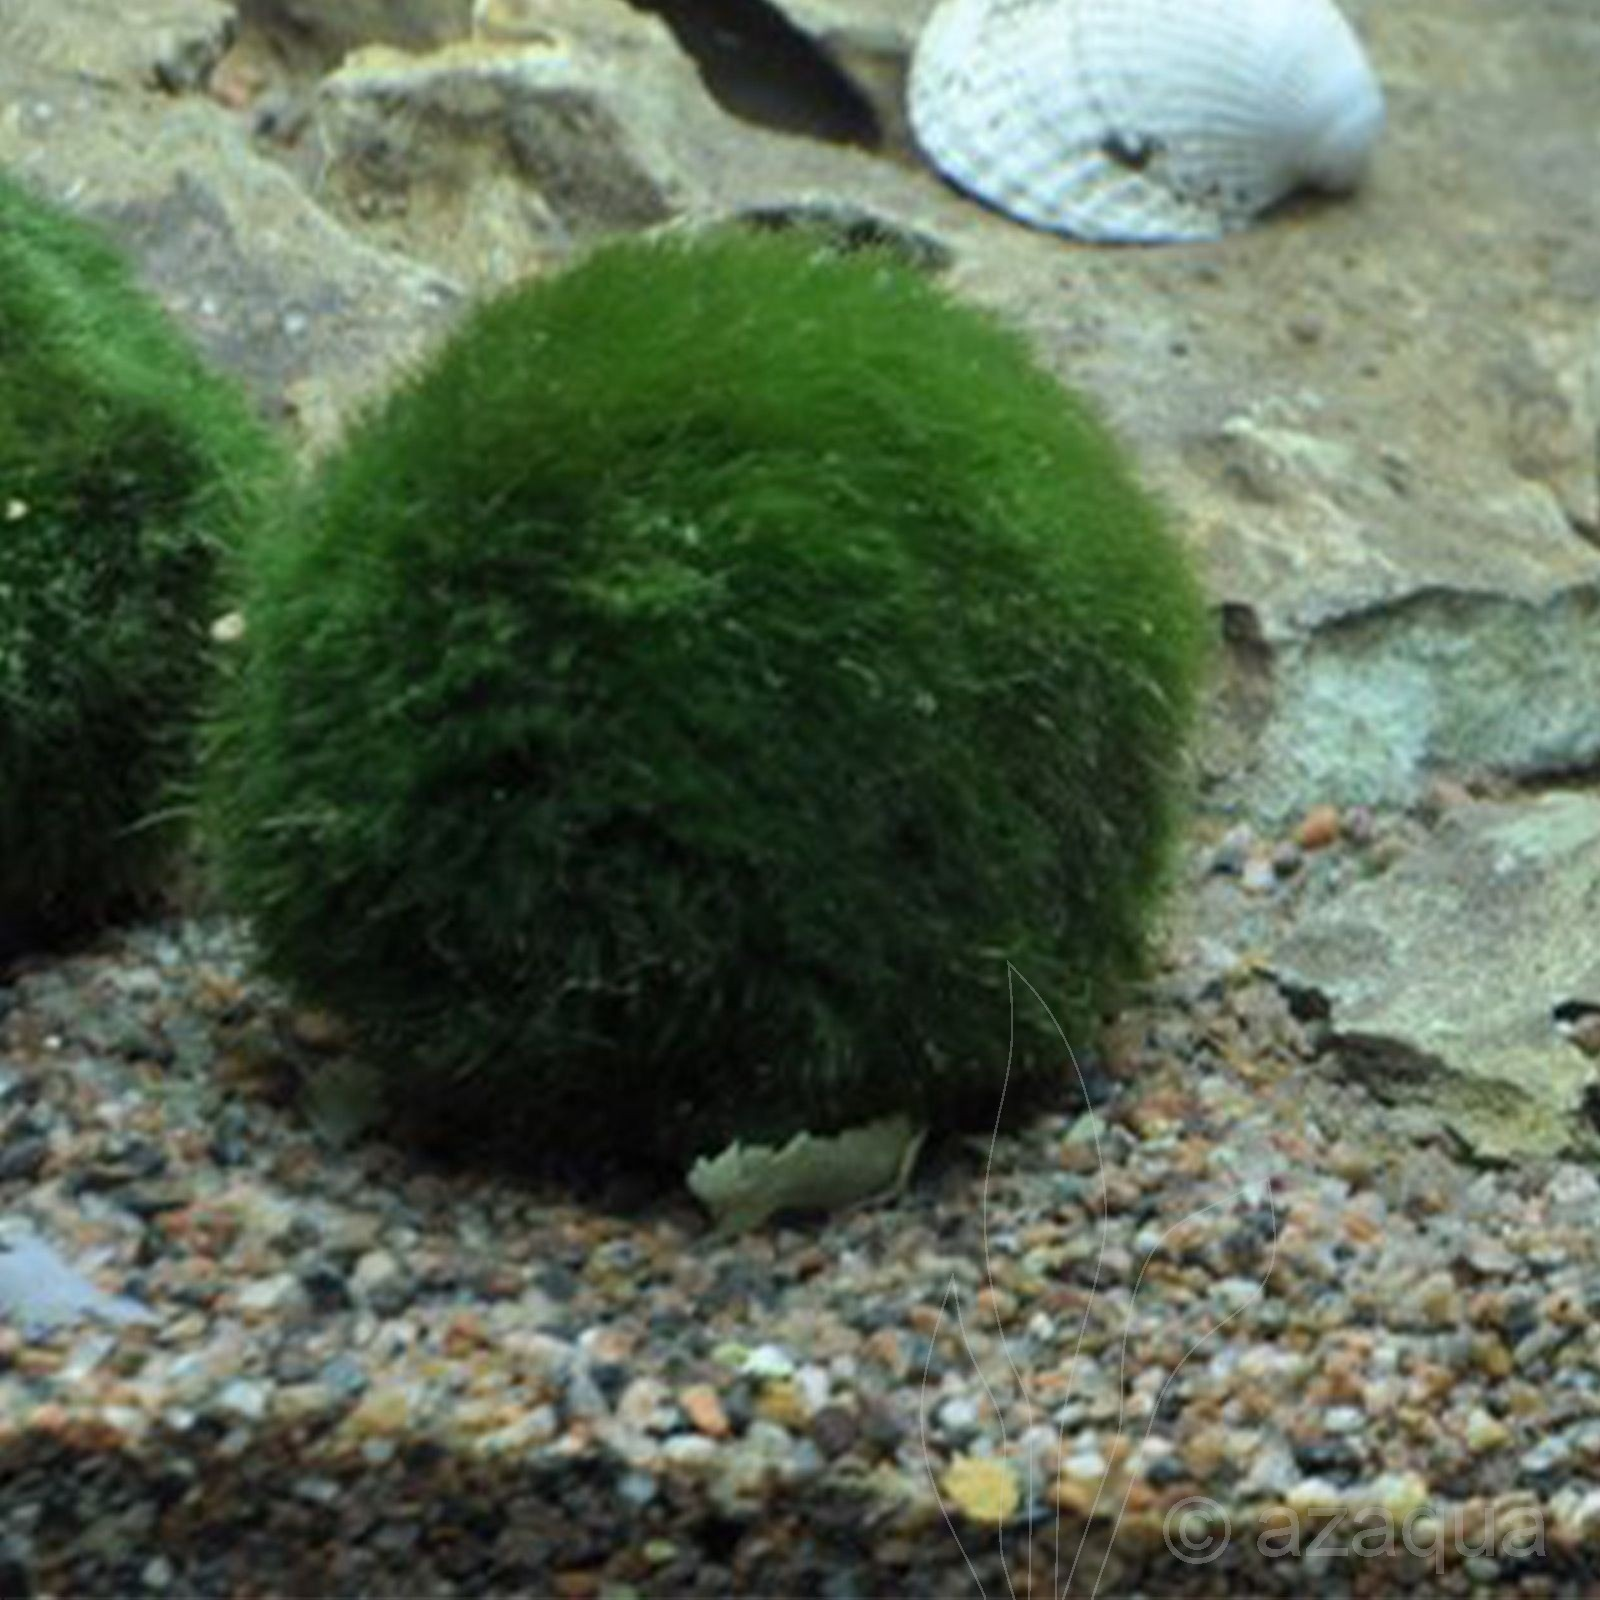 Cladophora aegagropila (moss ball)